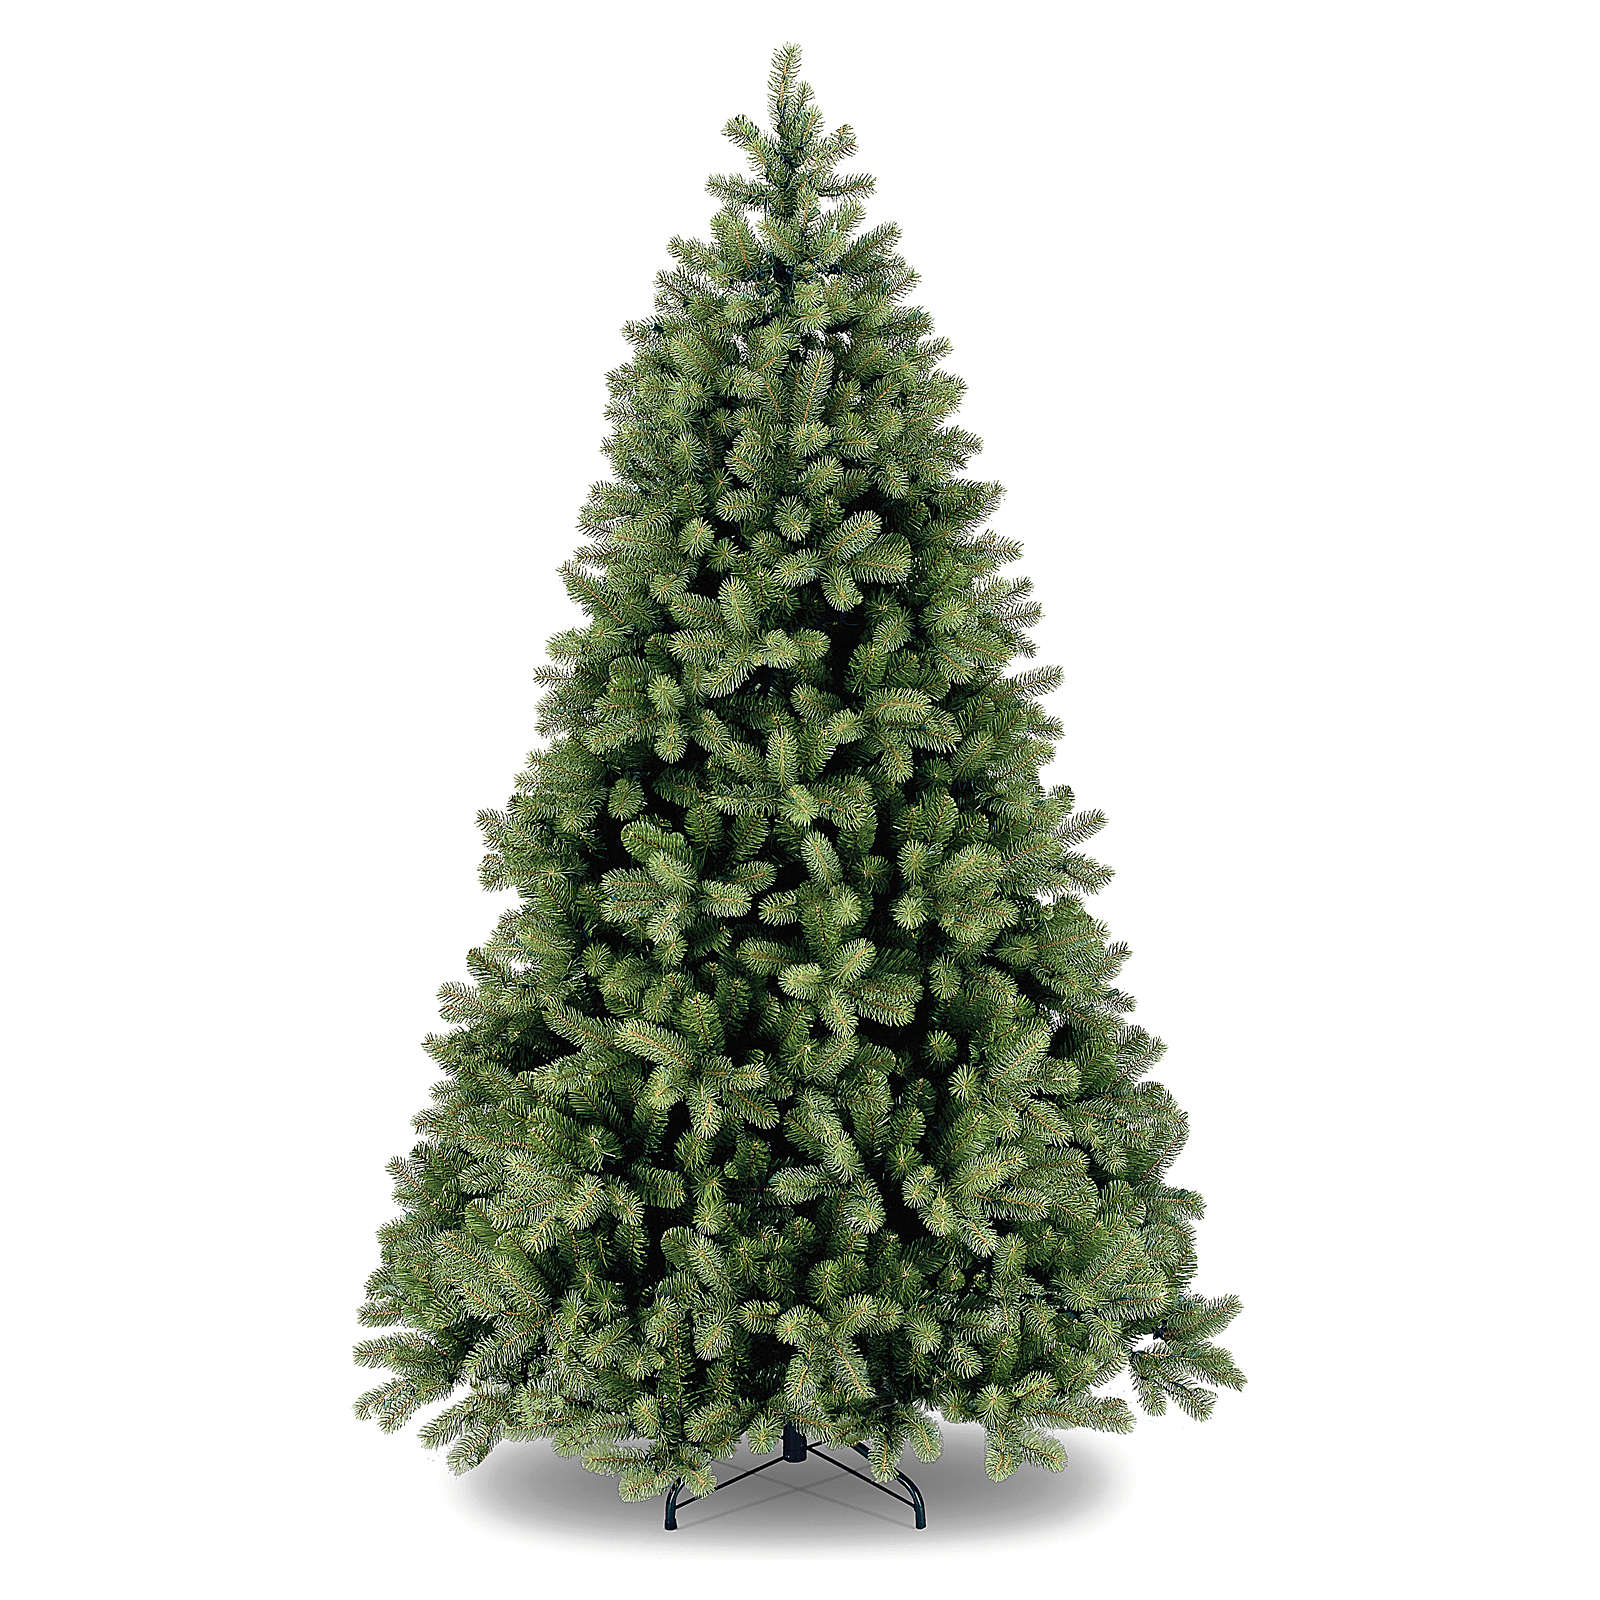 Sapin de Noël 360 cm vert polyéthylène Bayberry Spruce Hinged 3